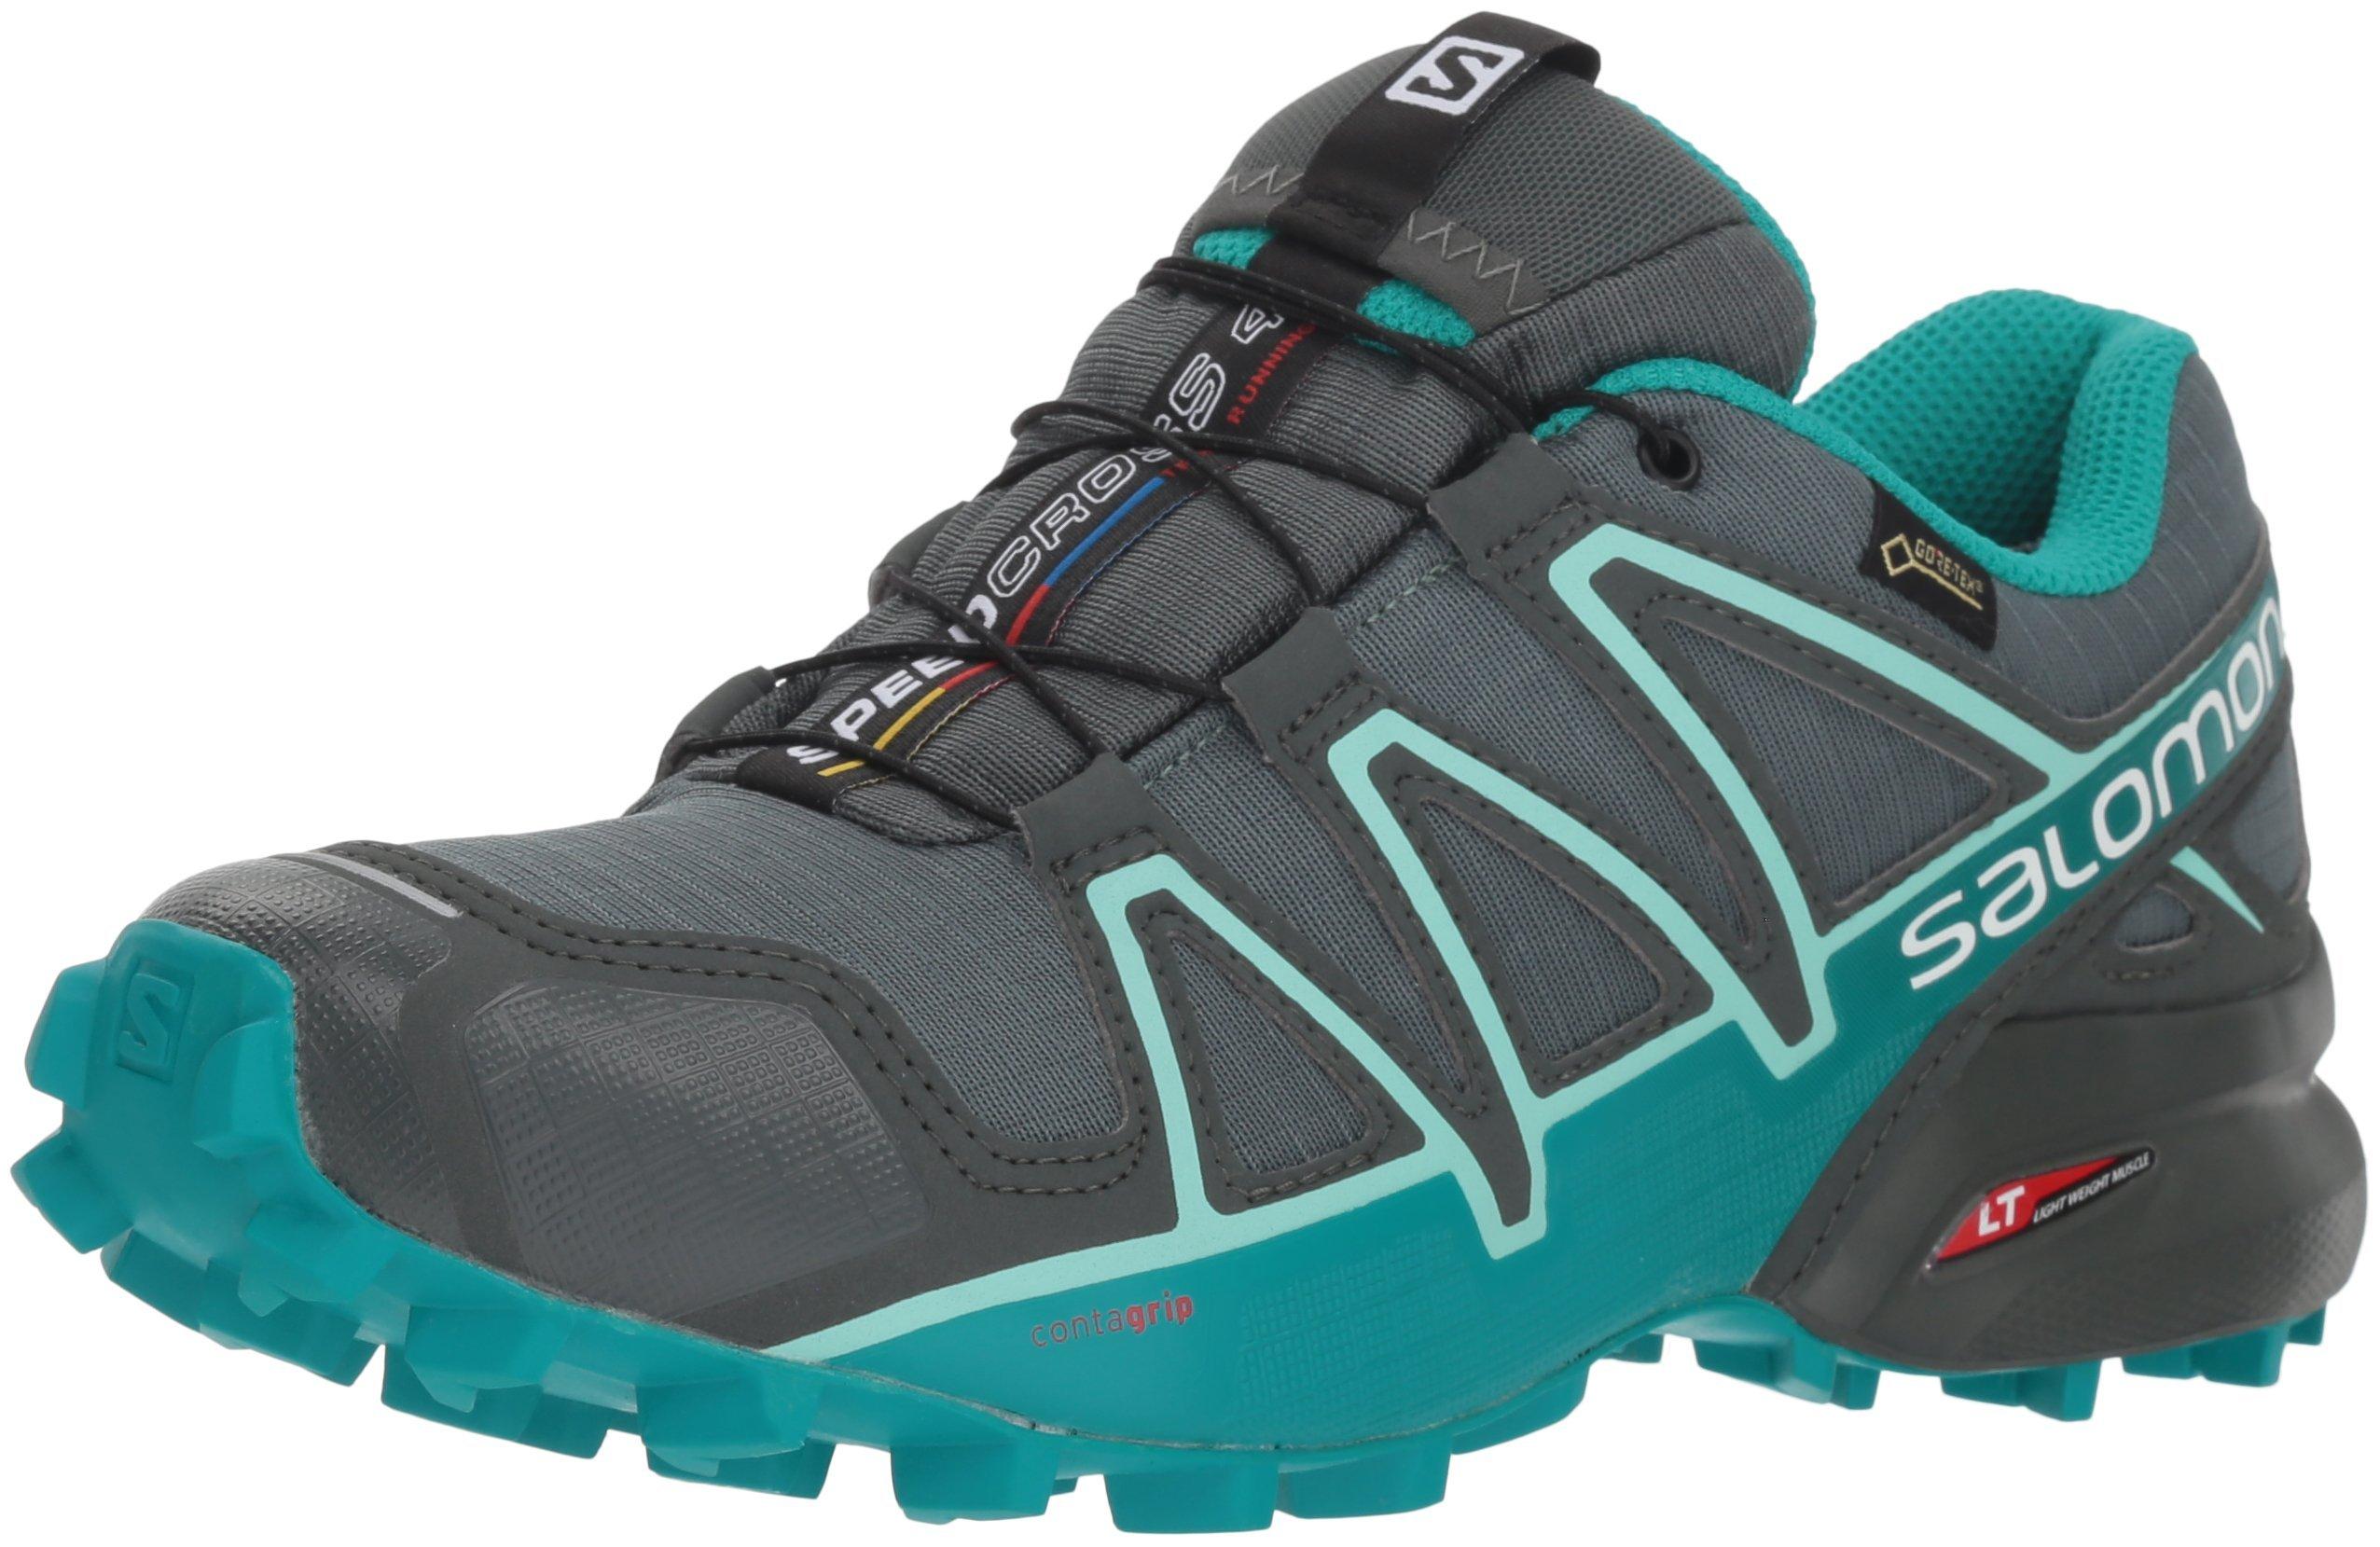 SALOMON Women's Speedcross 4 GTX W Trail Running Shoe, Balsam Tropical Green/Beach Glass, 9.5 M US by SALOMON